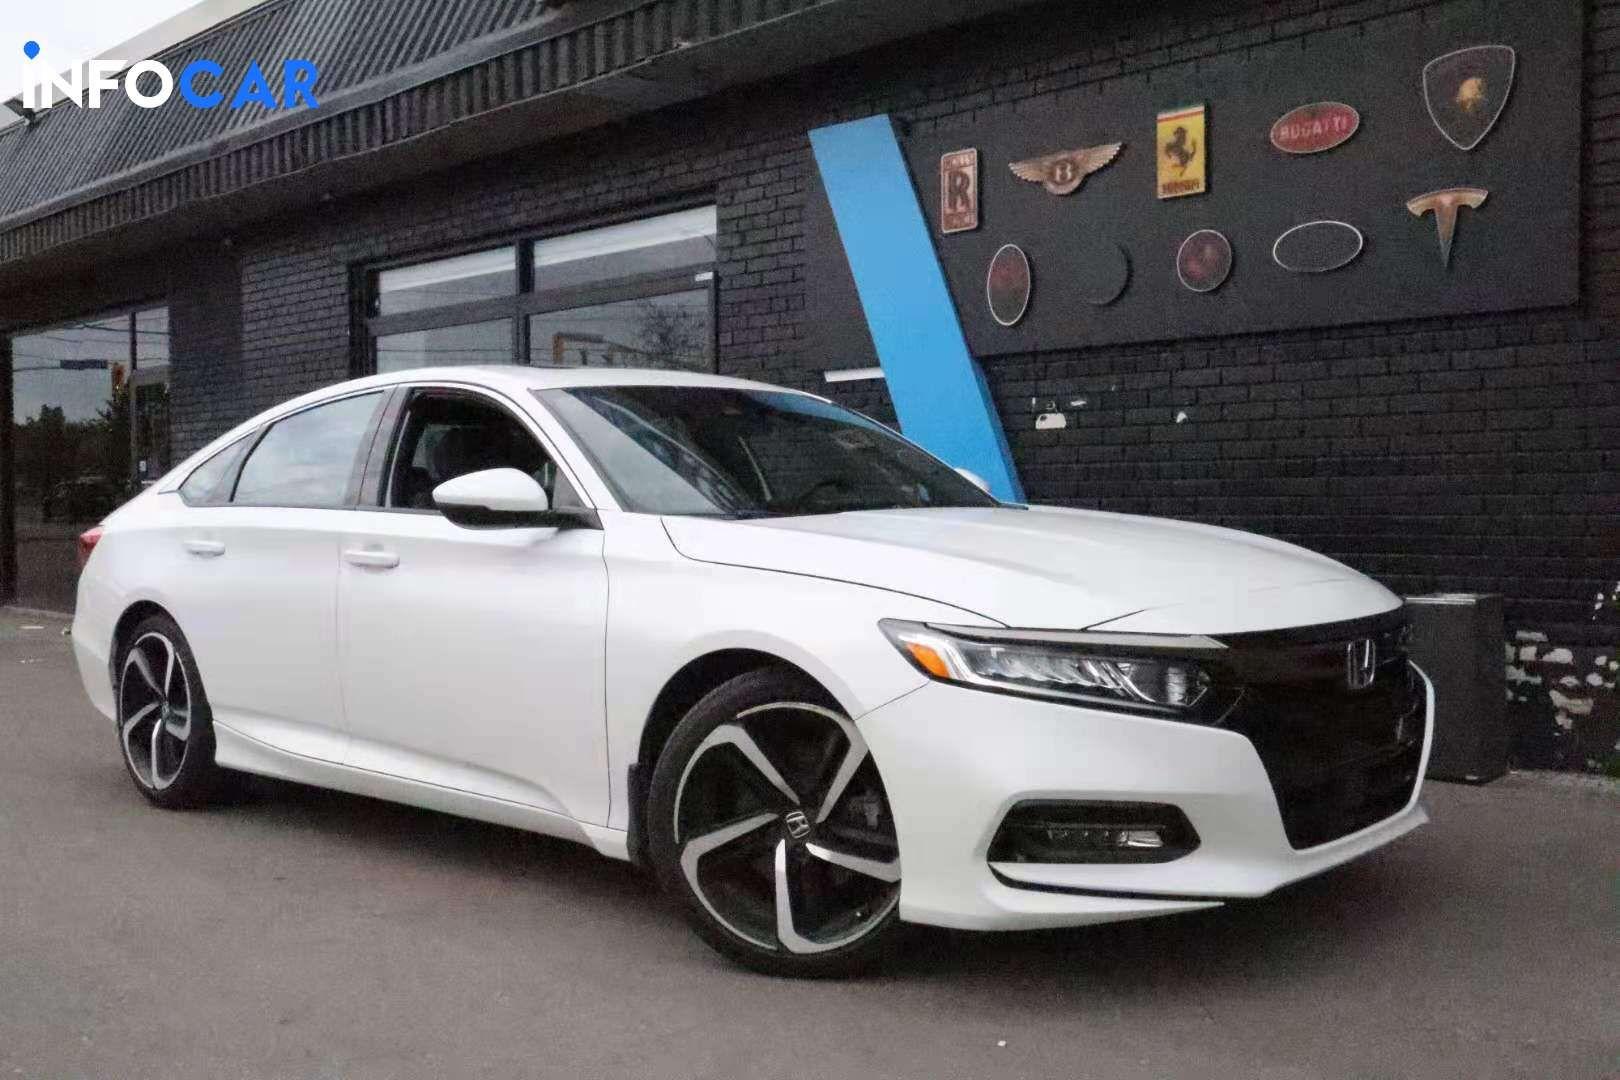 2019 Honda Accord sport  - INFOCAR - Toronto's Most Comprehensive New and Used Auto Trading Platform